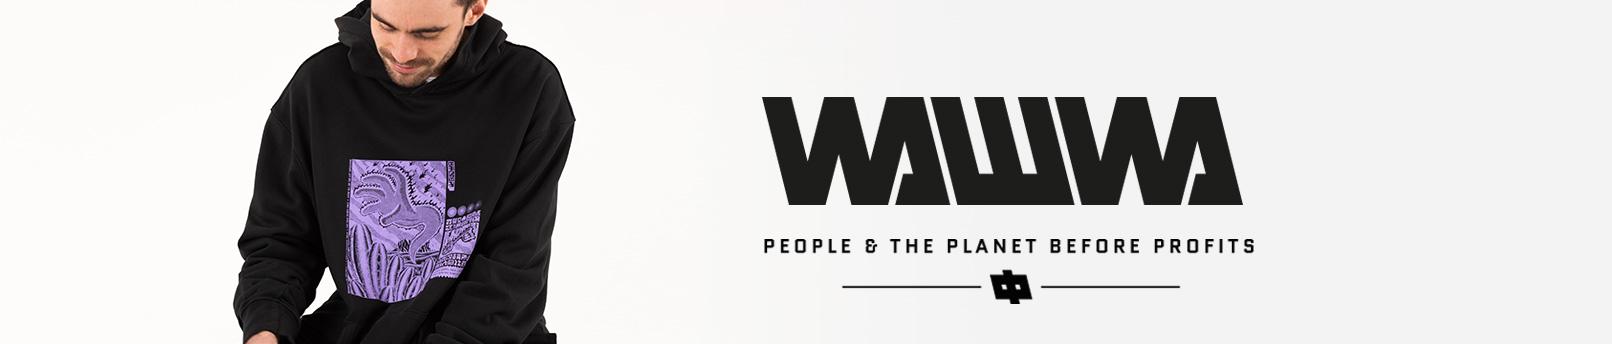 WAWWA shoppen